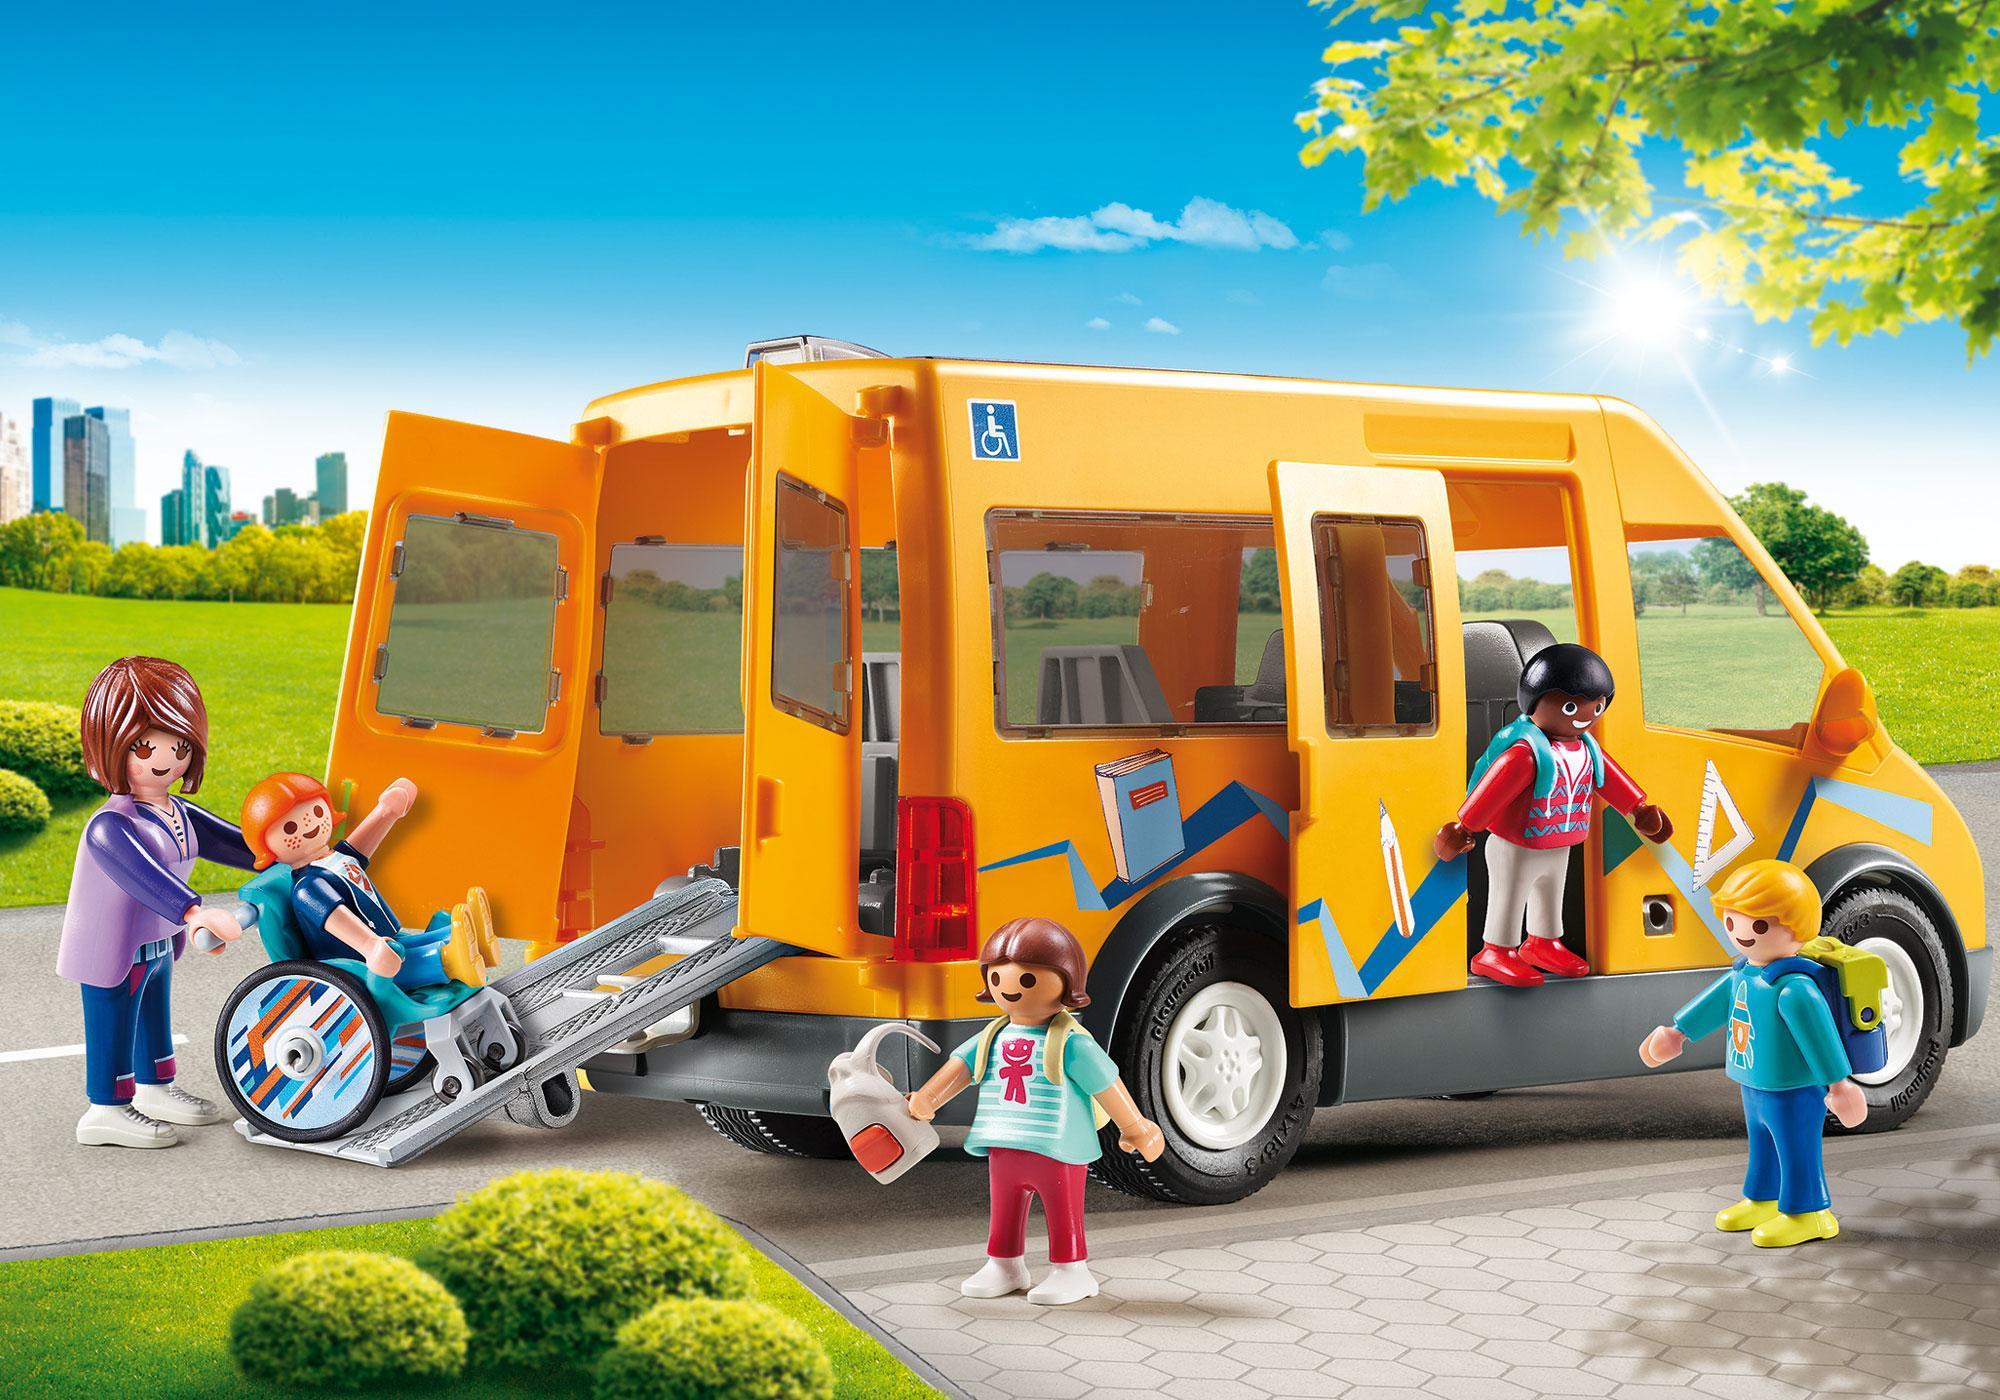 9419_product_detail/Σχολικό λεωφορείο